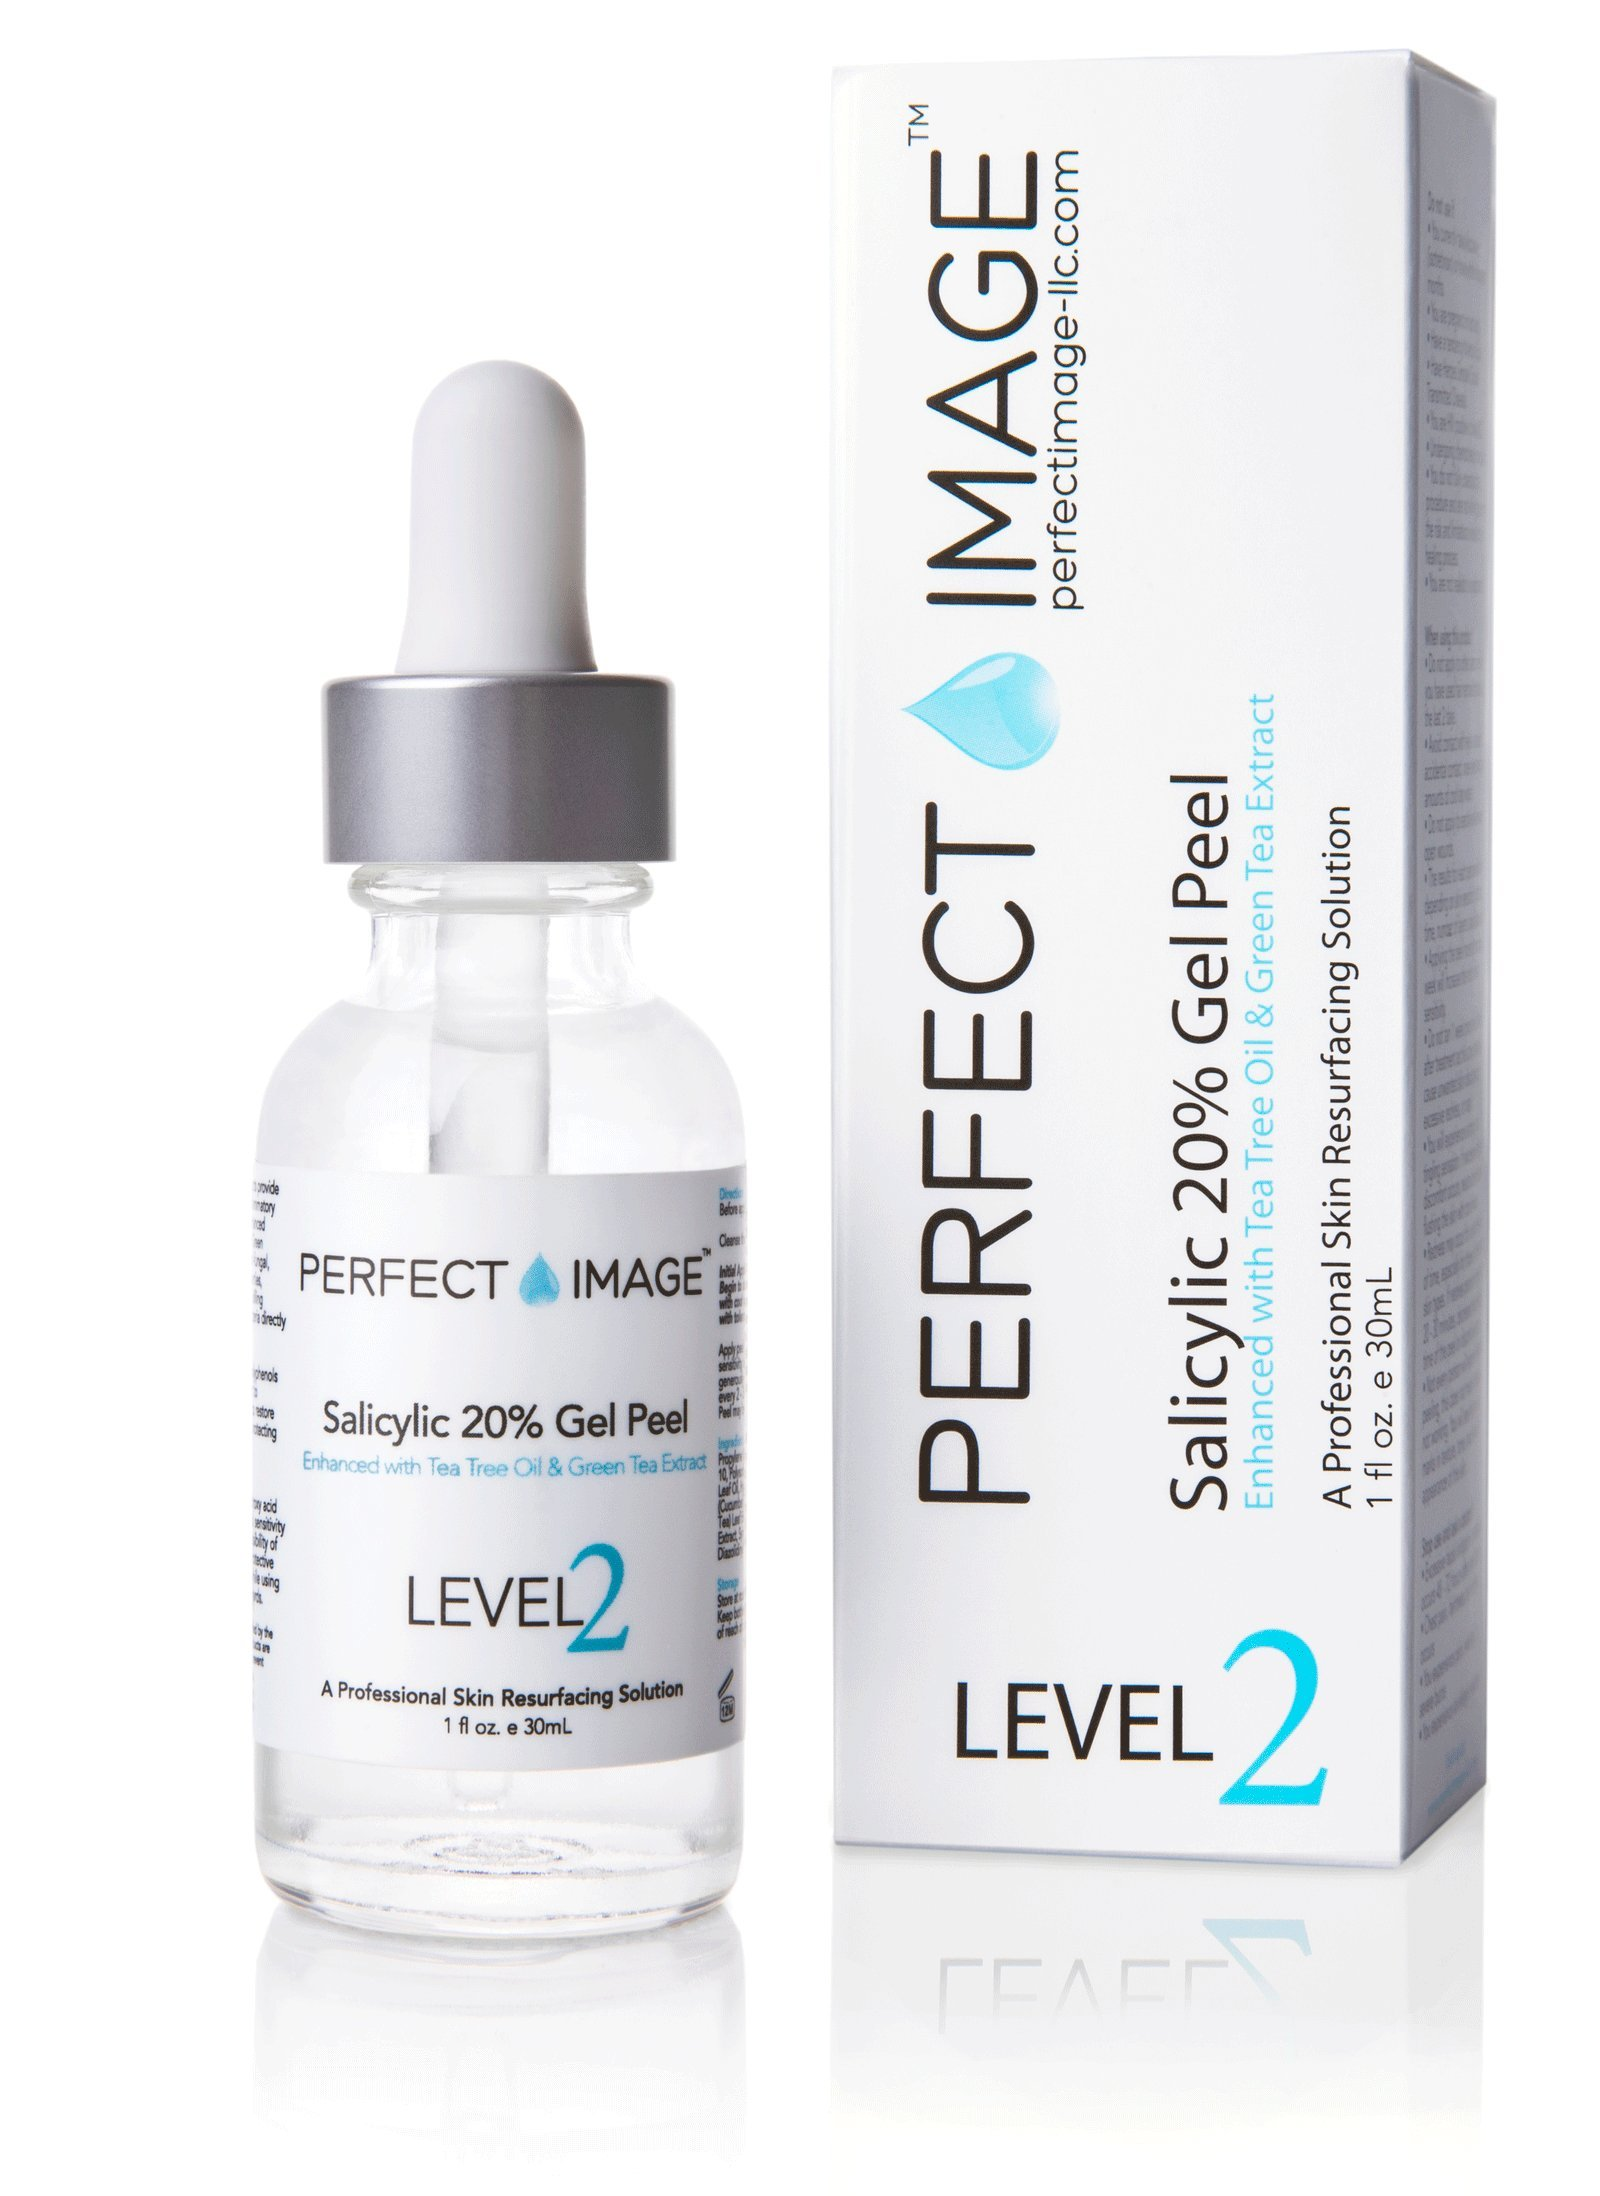 Salicylic Acid 20% Gel Peel - Enhanced with Tea Tree Oil & Green Tea Extract by Perfect Image